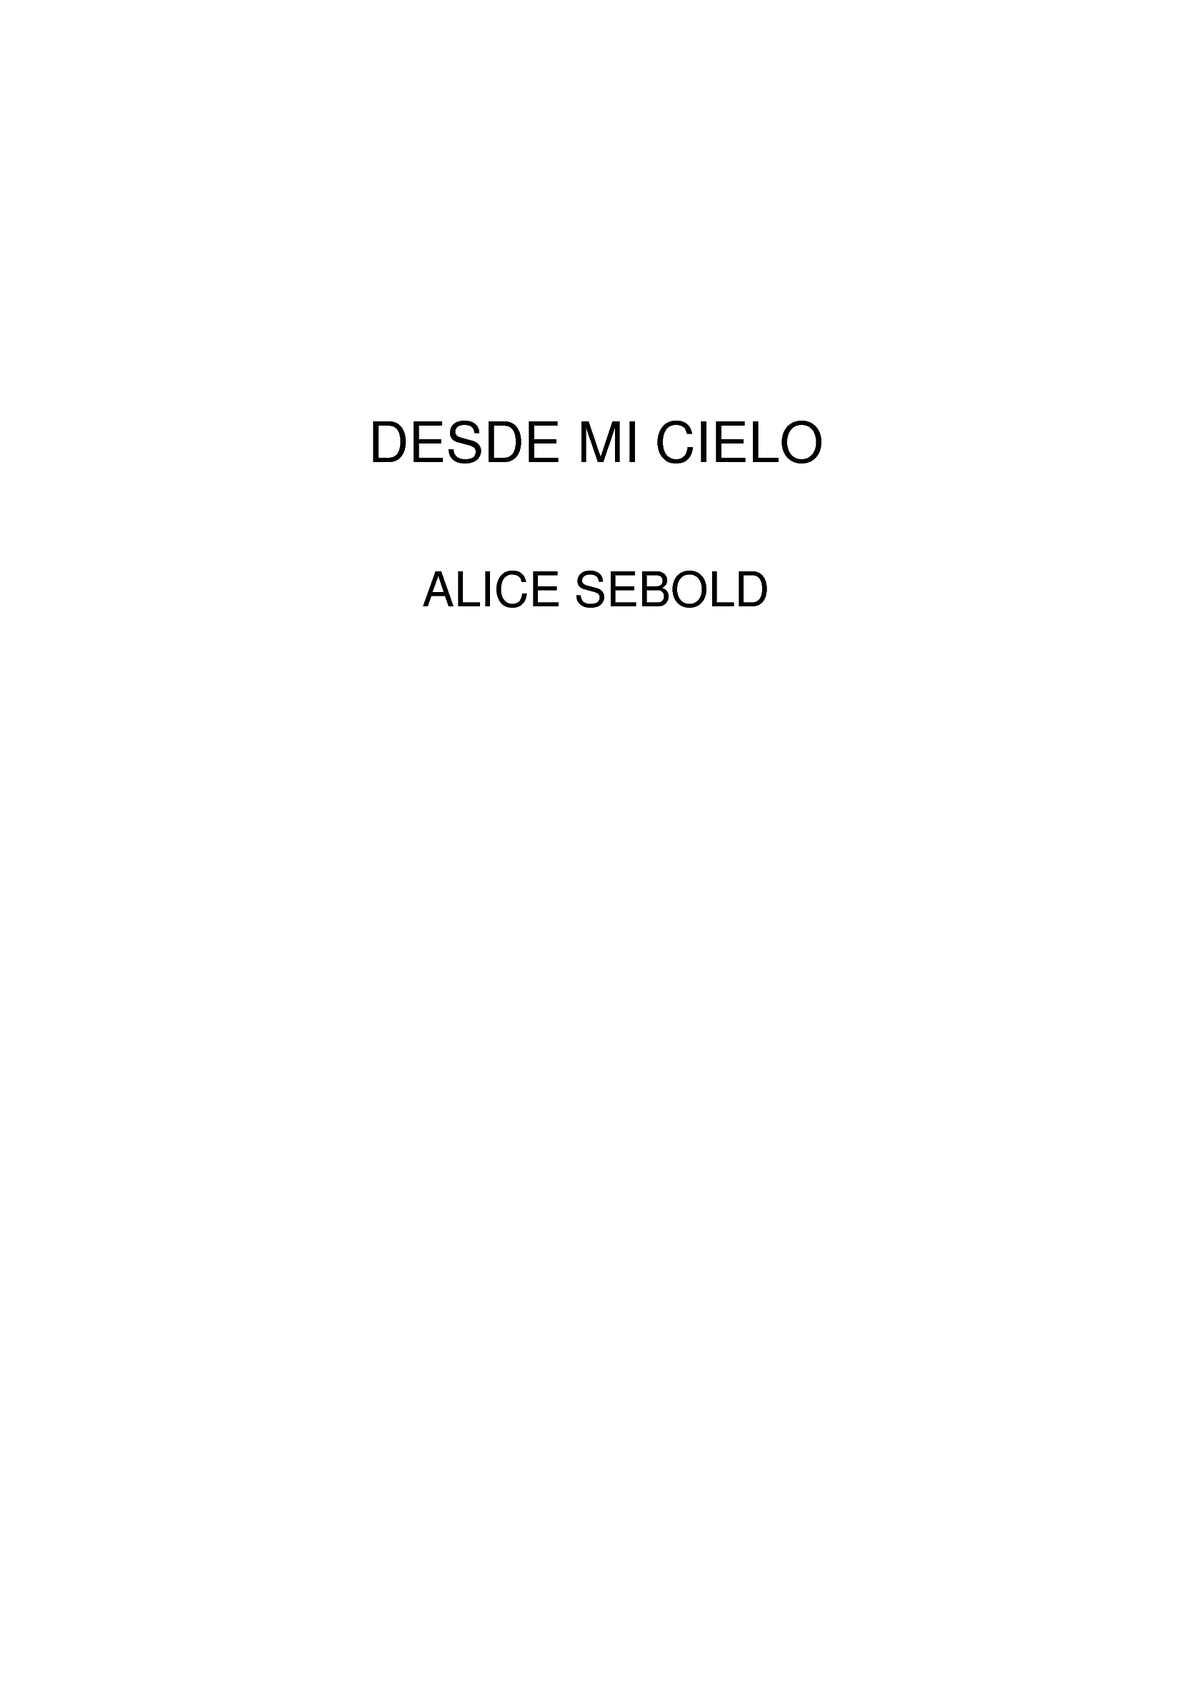 Calaméo - Desde mi cielo libro pdf